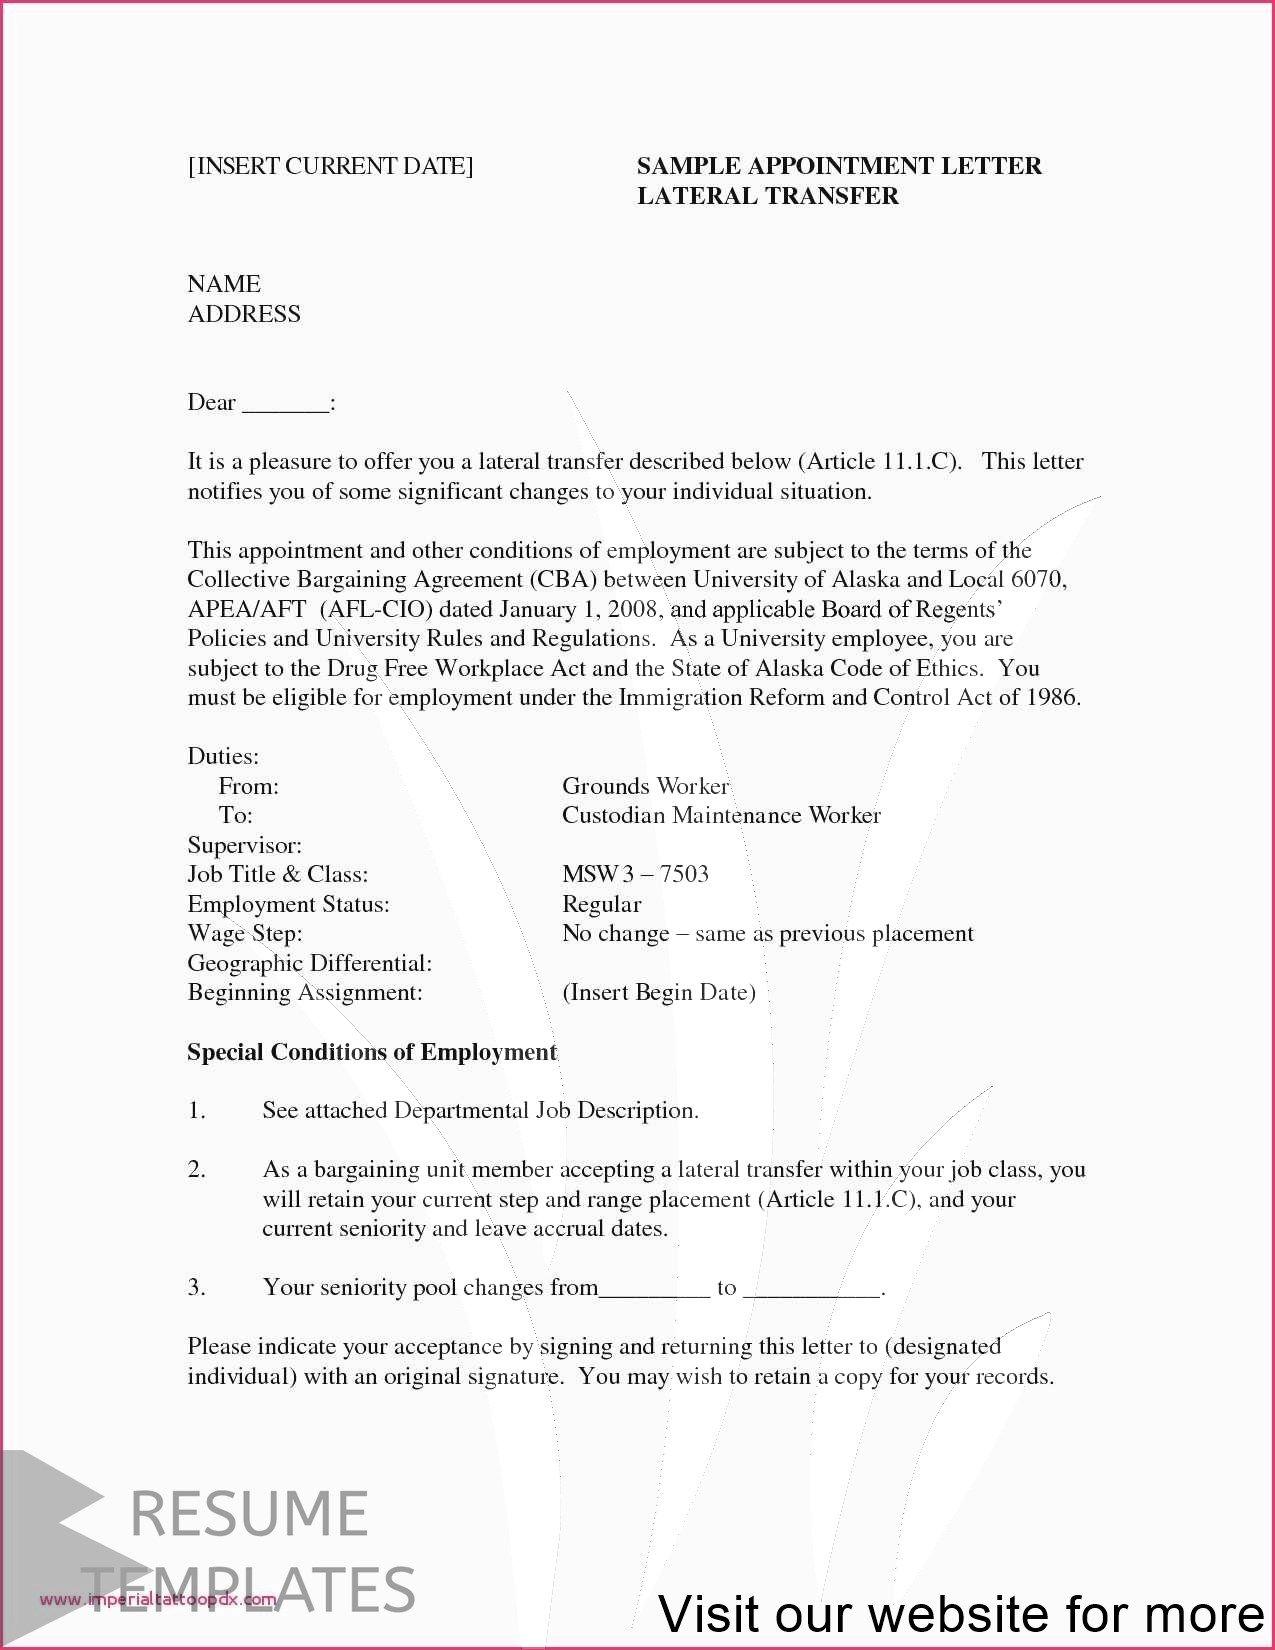 resume builder app for pc Professional in 2020 Resume